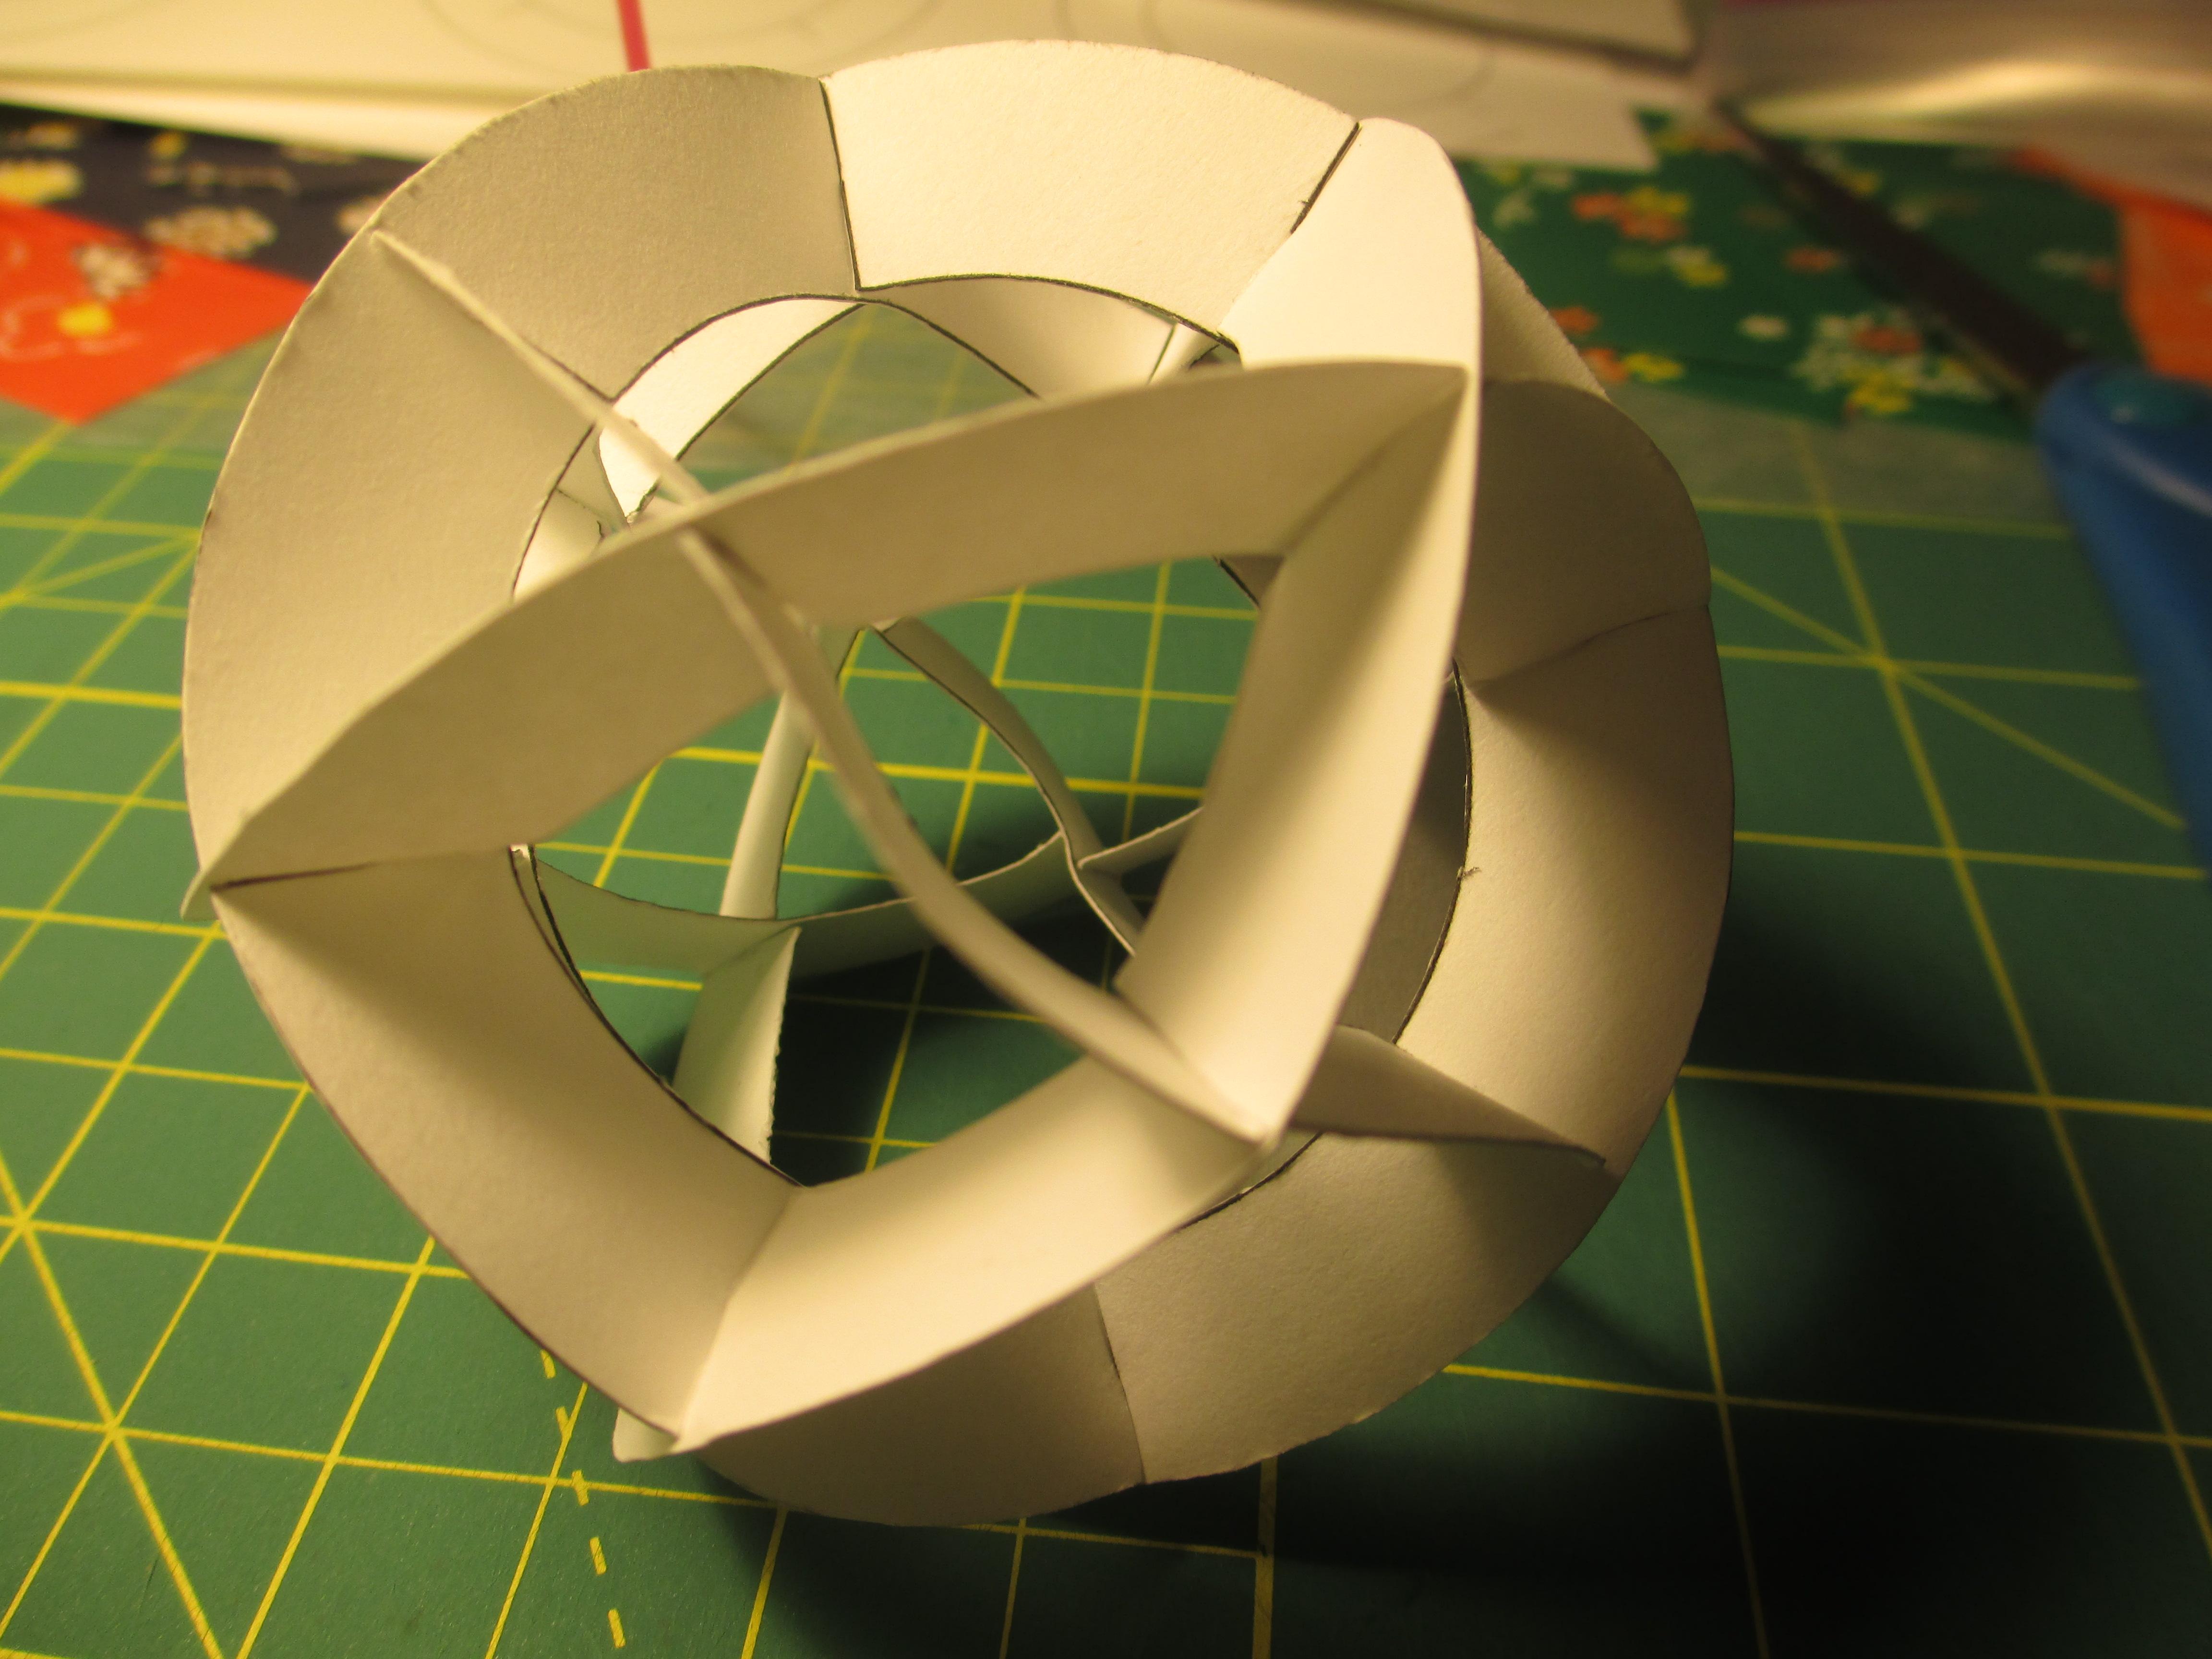 Wireframe Sphere Template By Heyro0 On Deviantart